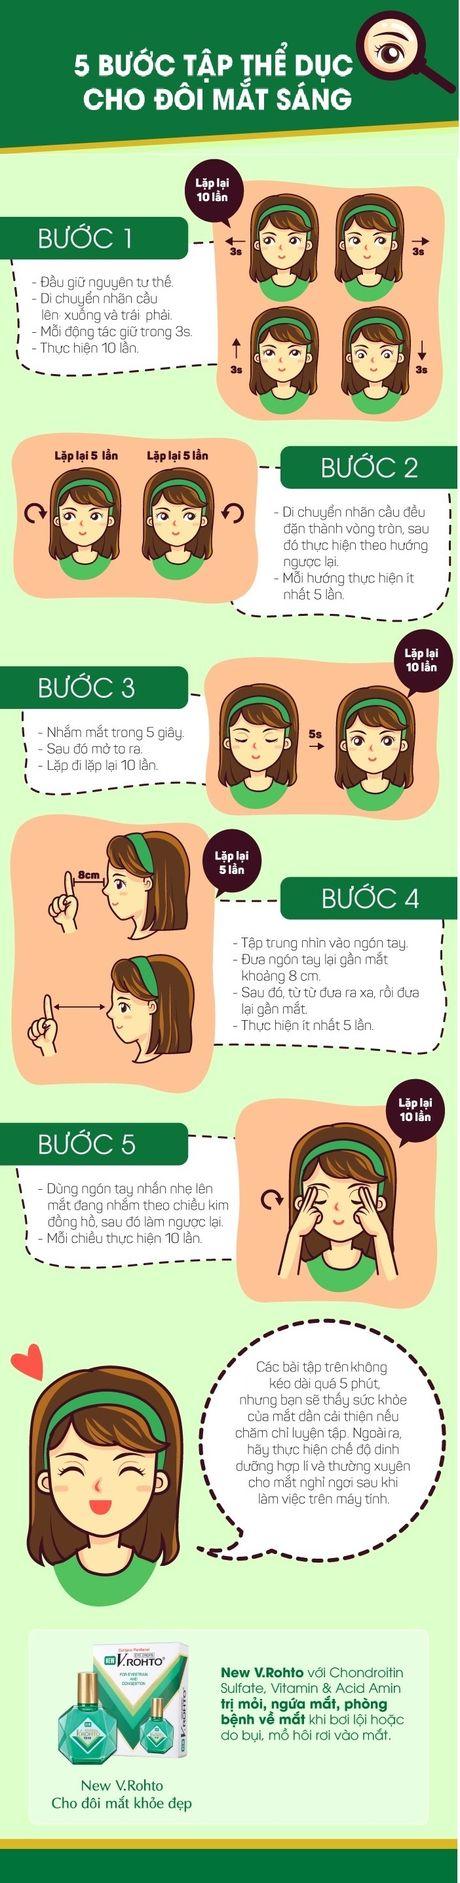 5 buoc tap the duc cho doi mat sang - Anh 1